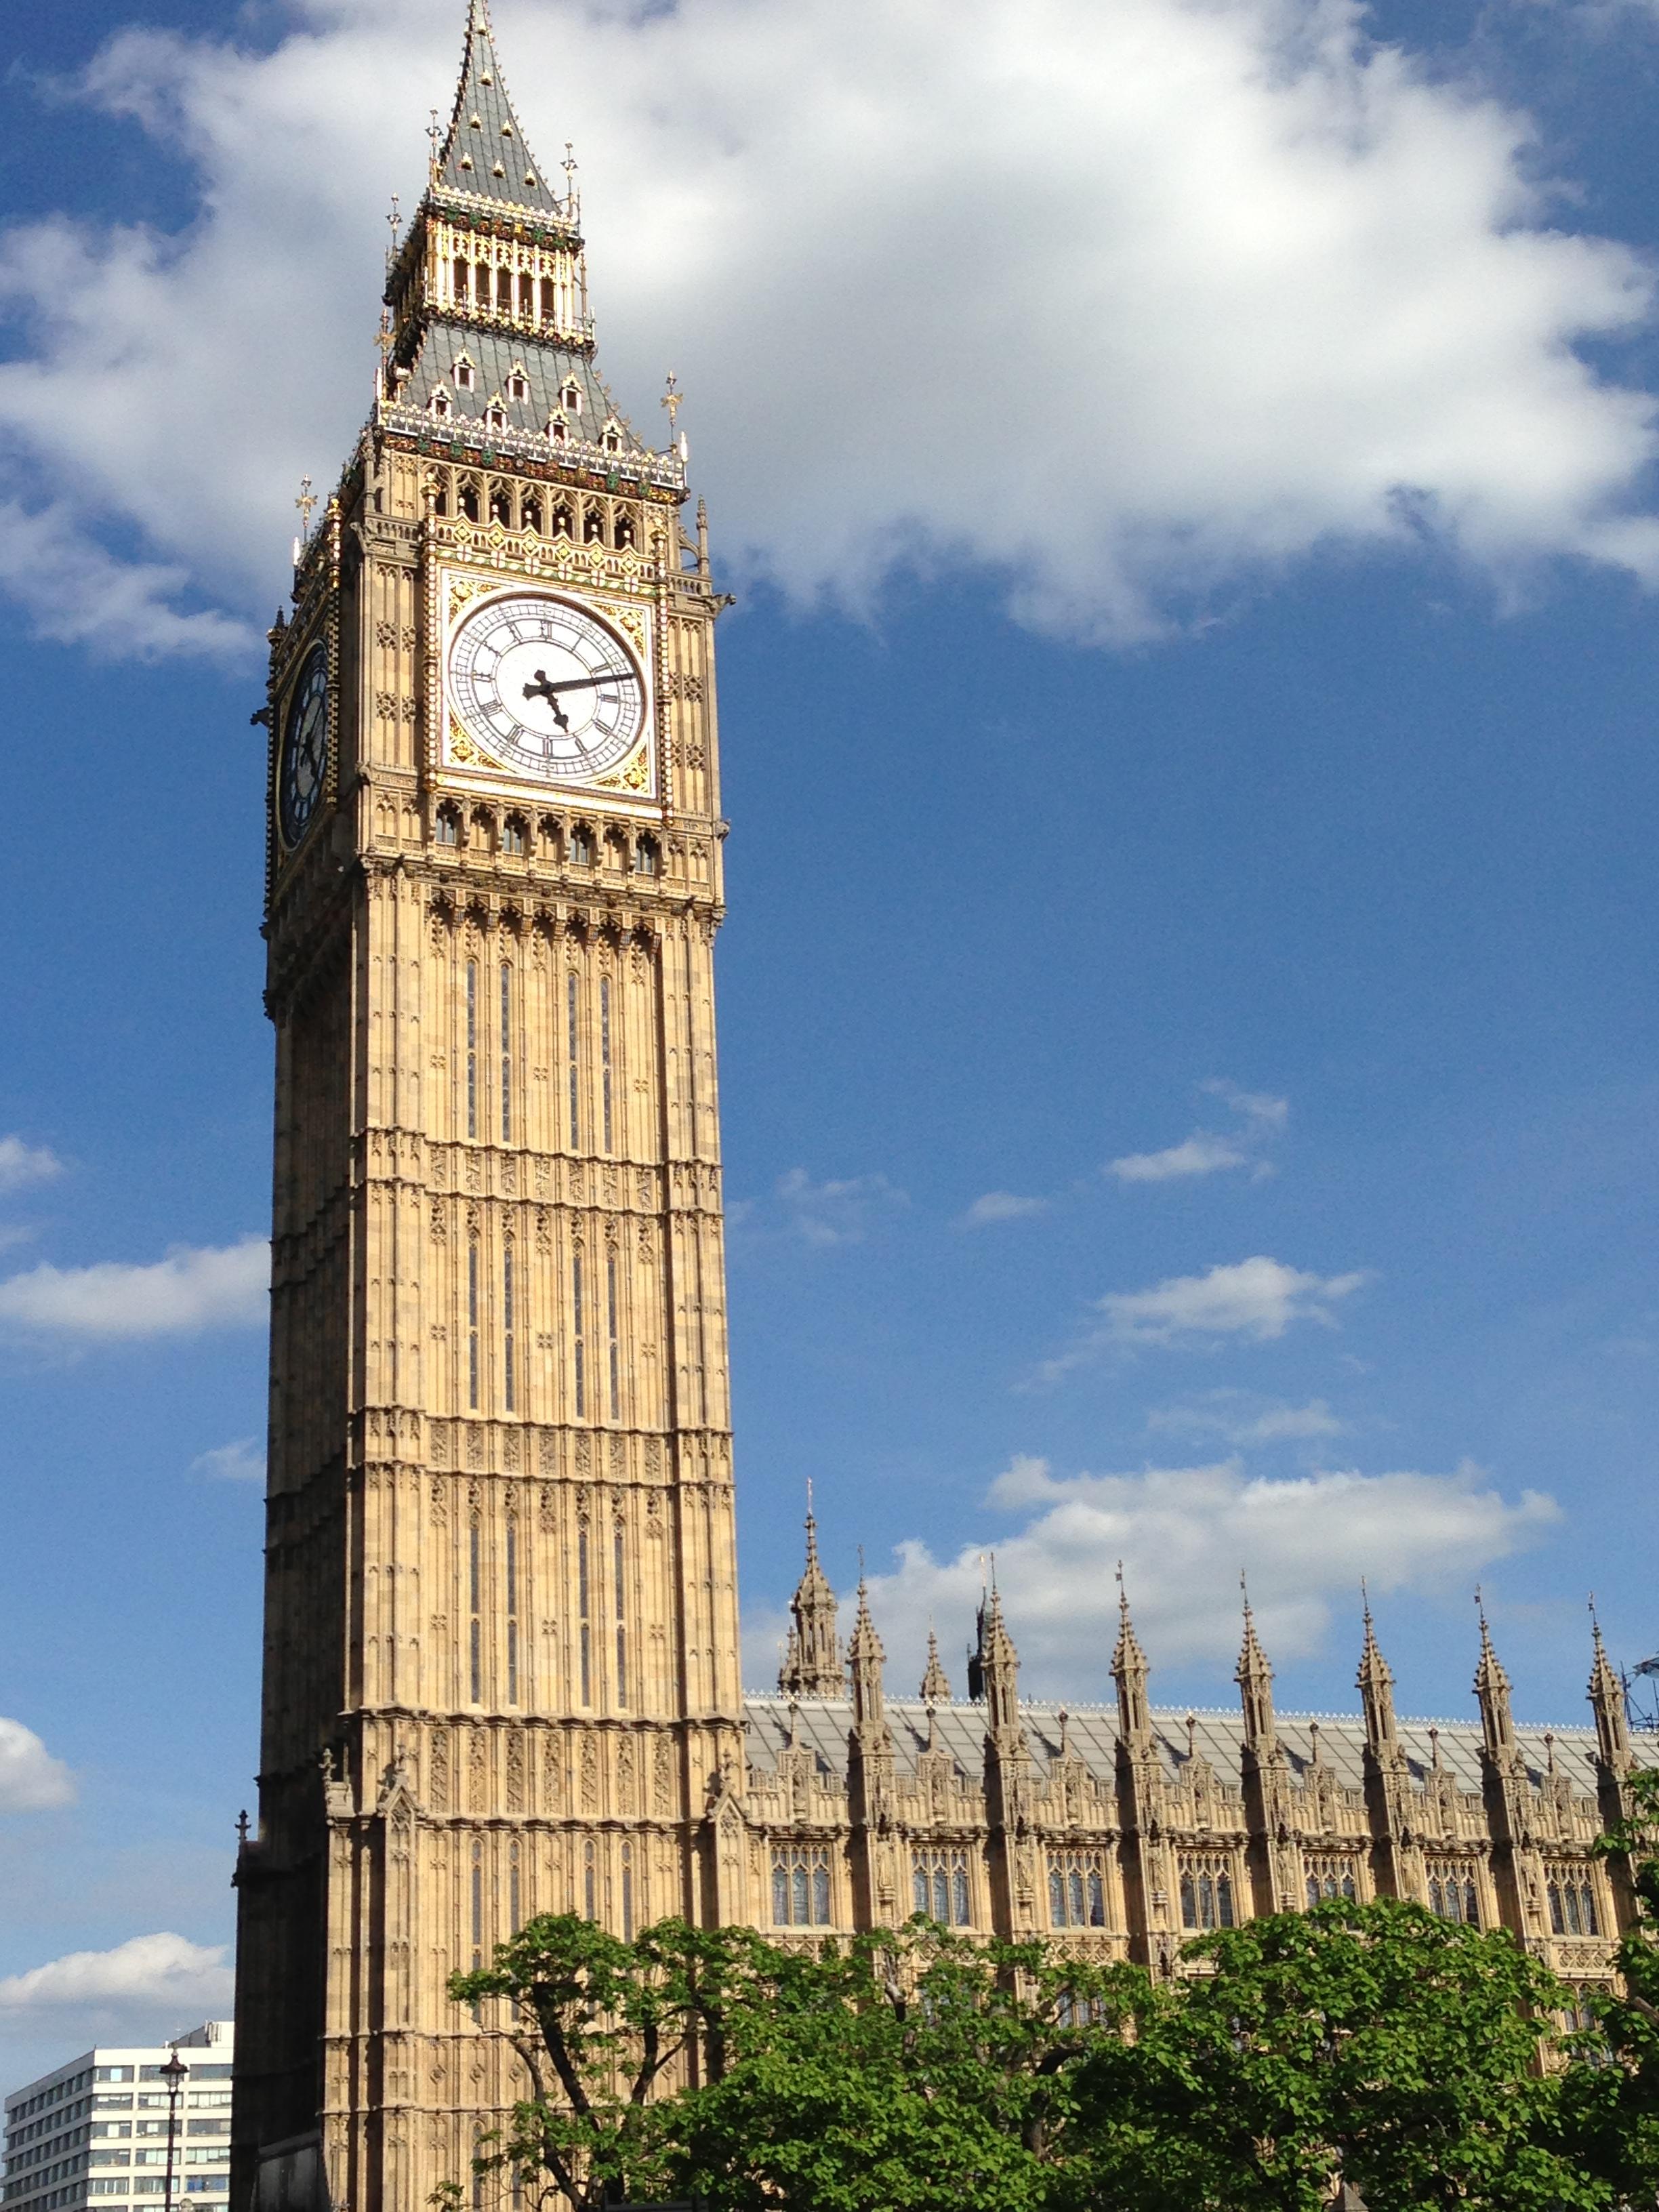 File:Elizabeth Tower, Palace of Westminster, London, UK - 20130629 ...